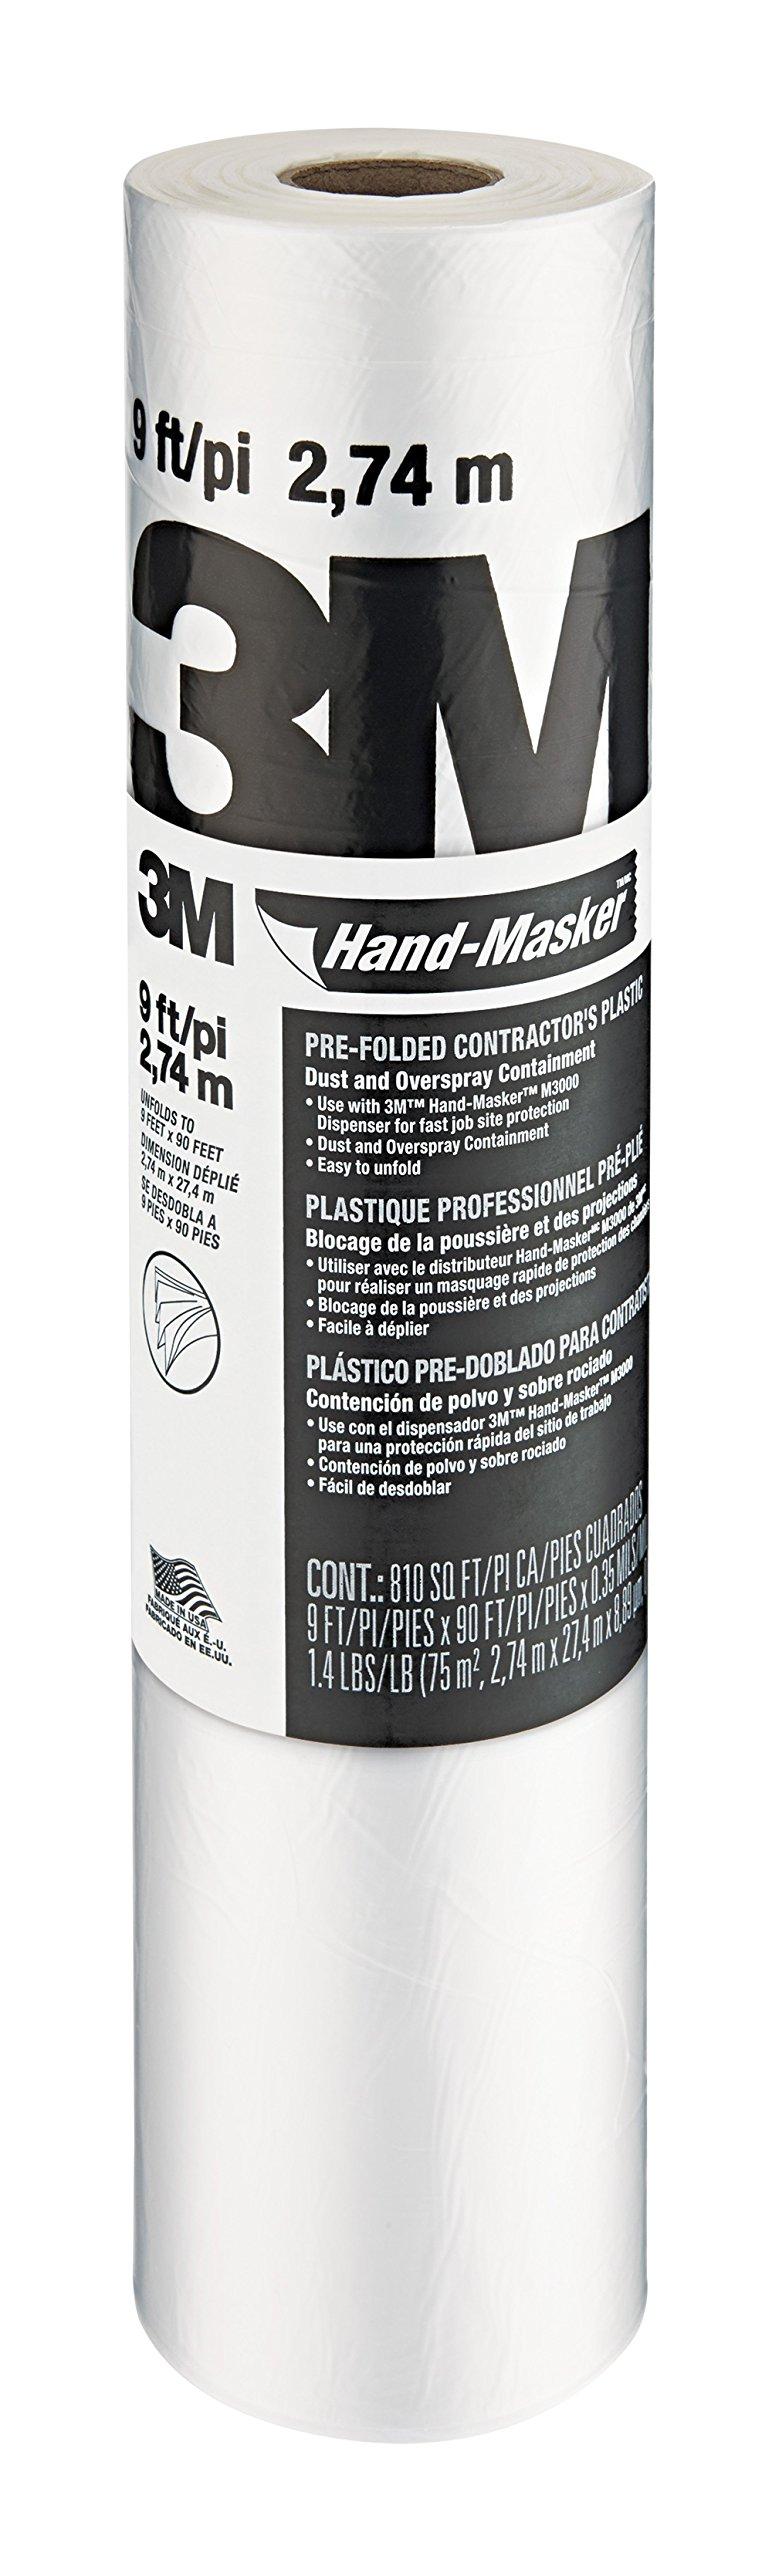 3M Hand Masker Contractor's Plastic, 9 x 90' x 0.00035'', 12 per Case